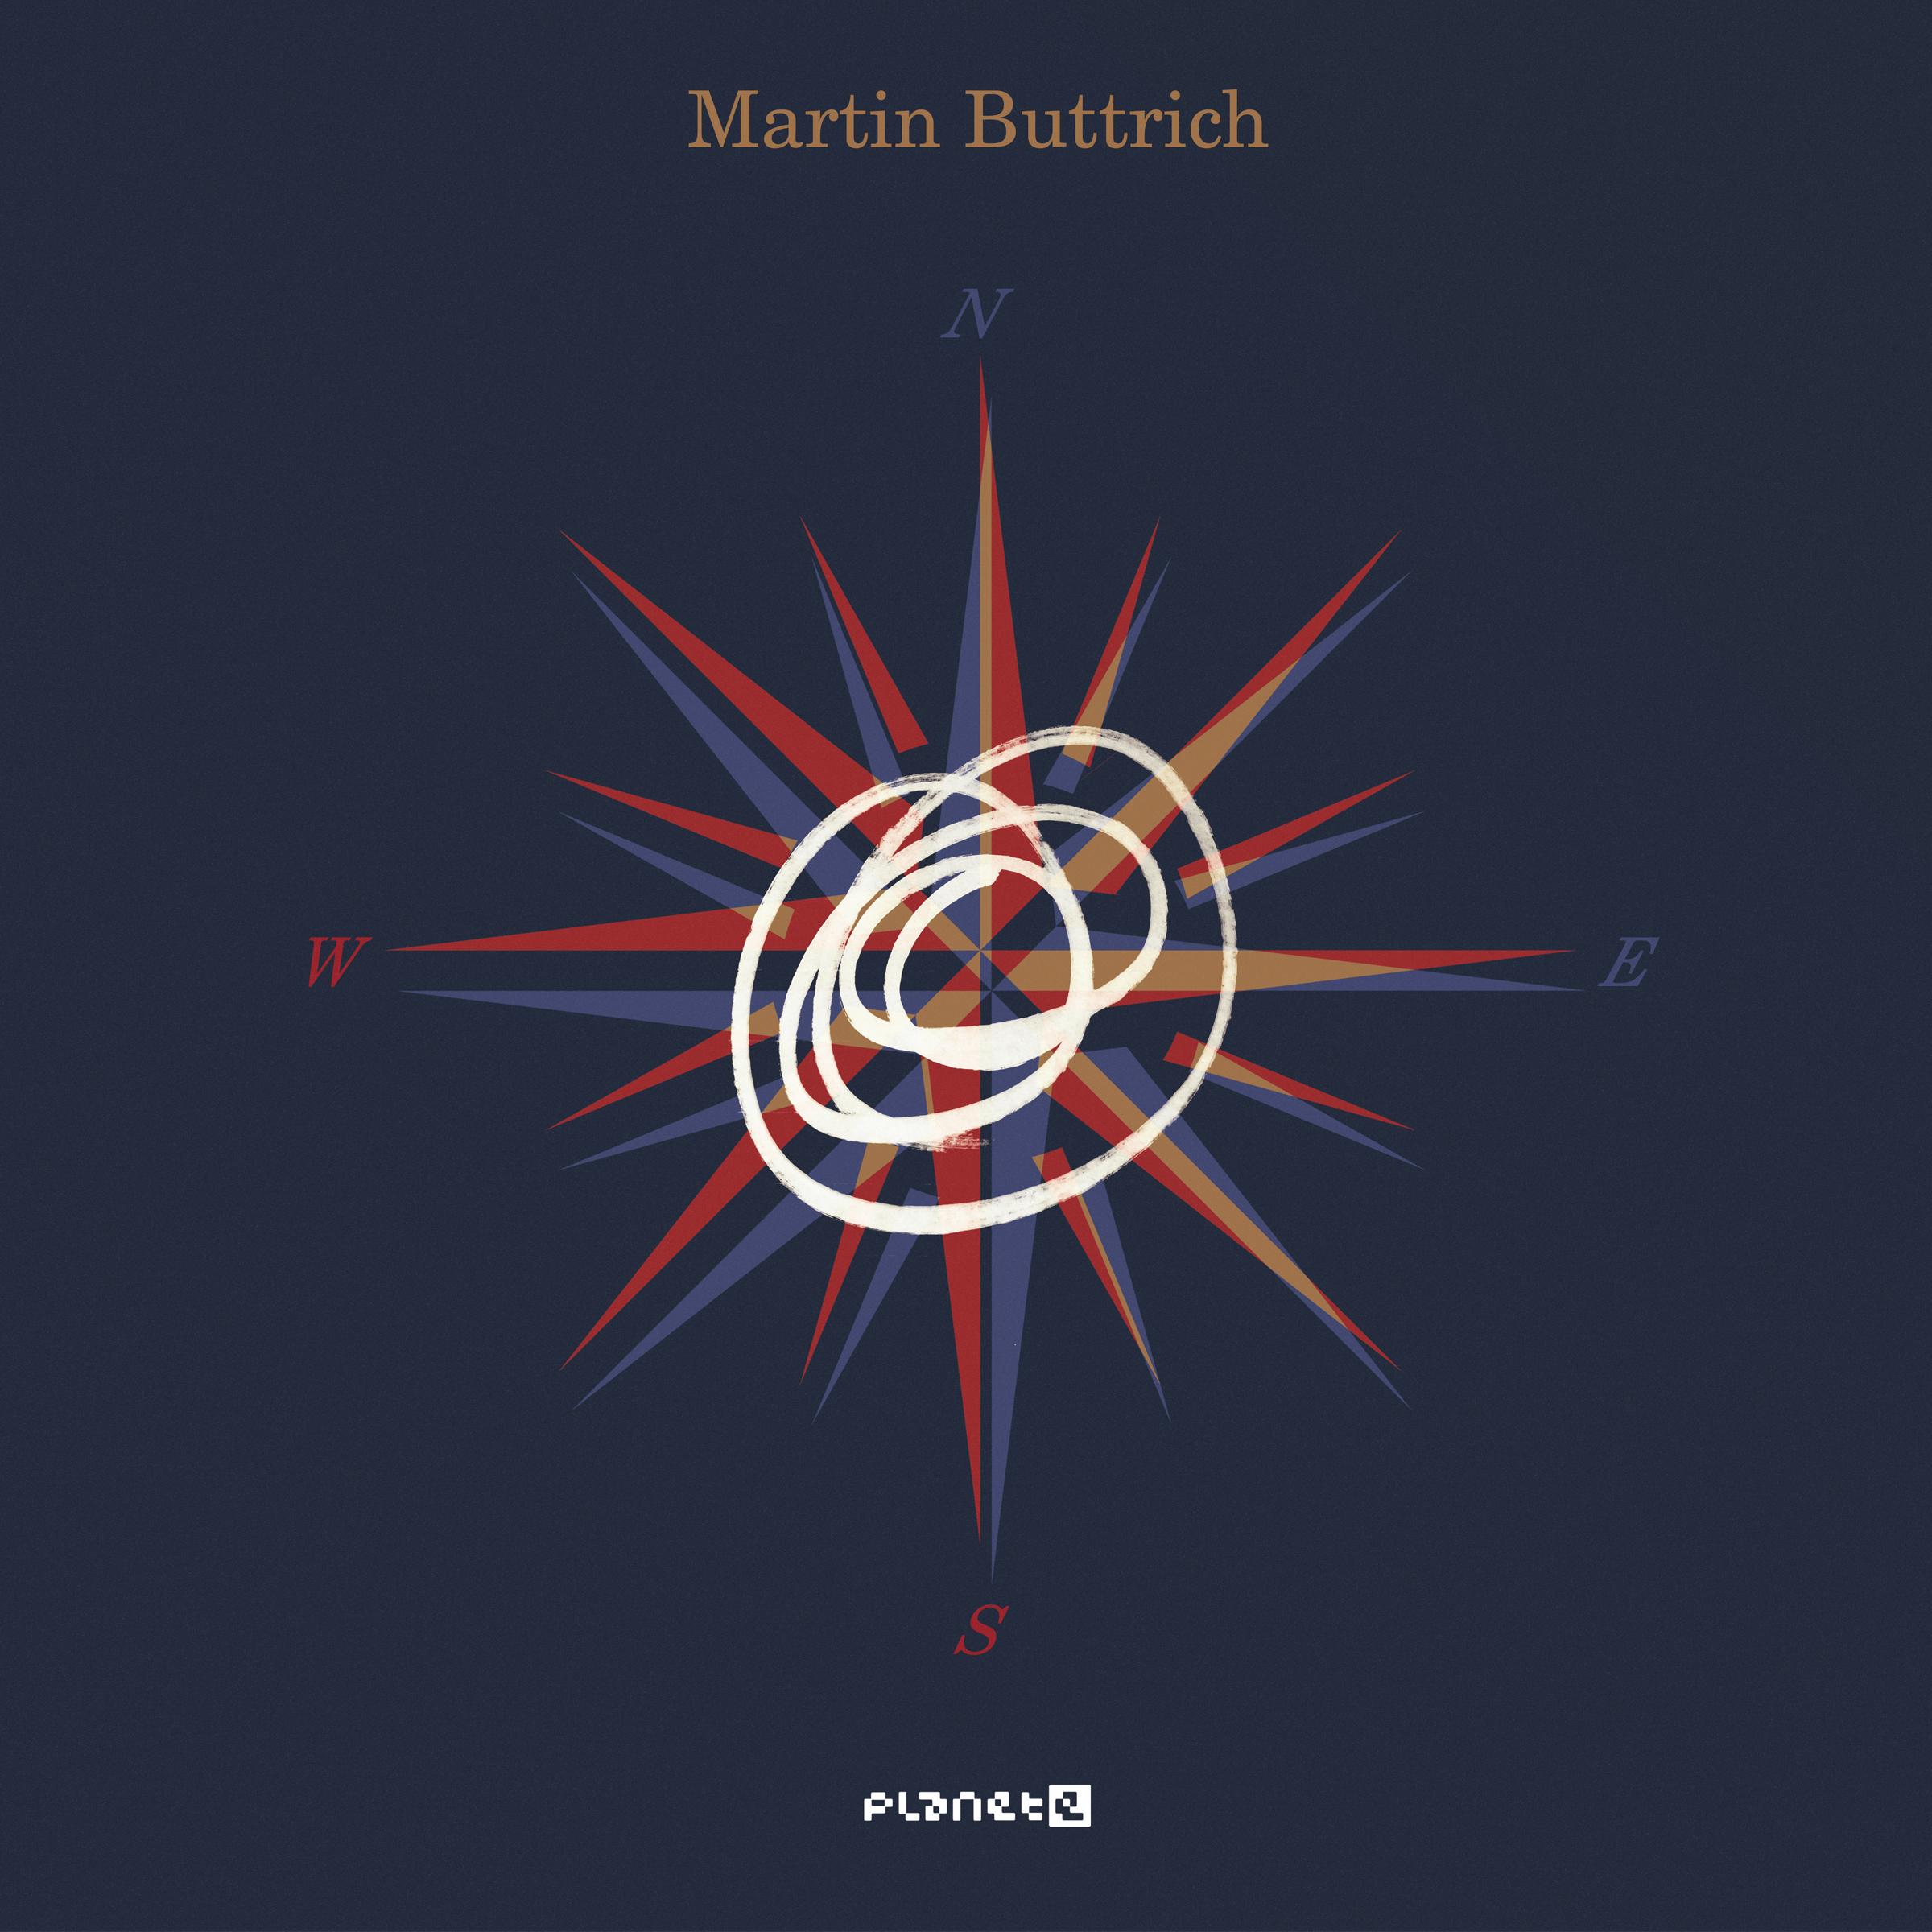 MARTINBUTTRICH_DIGITAL.jpg